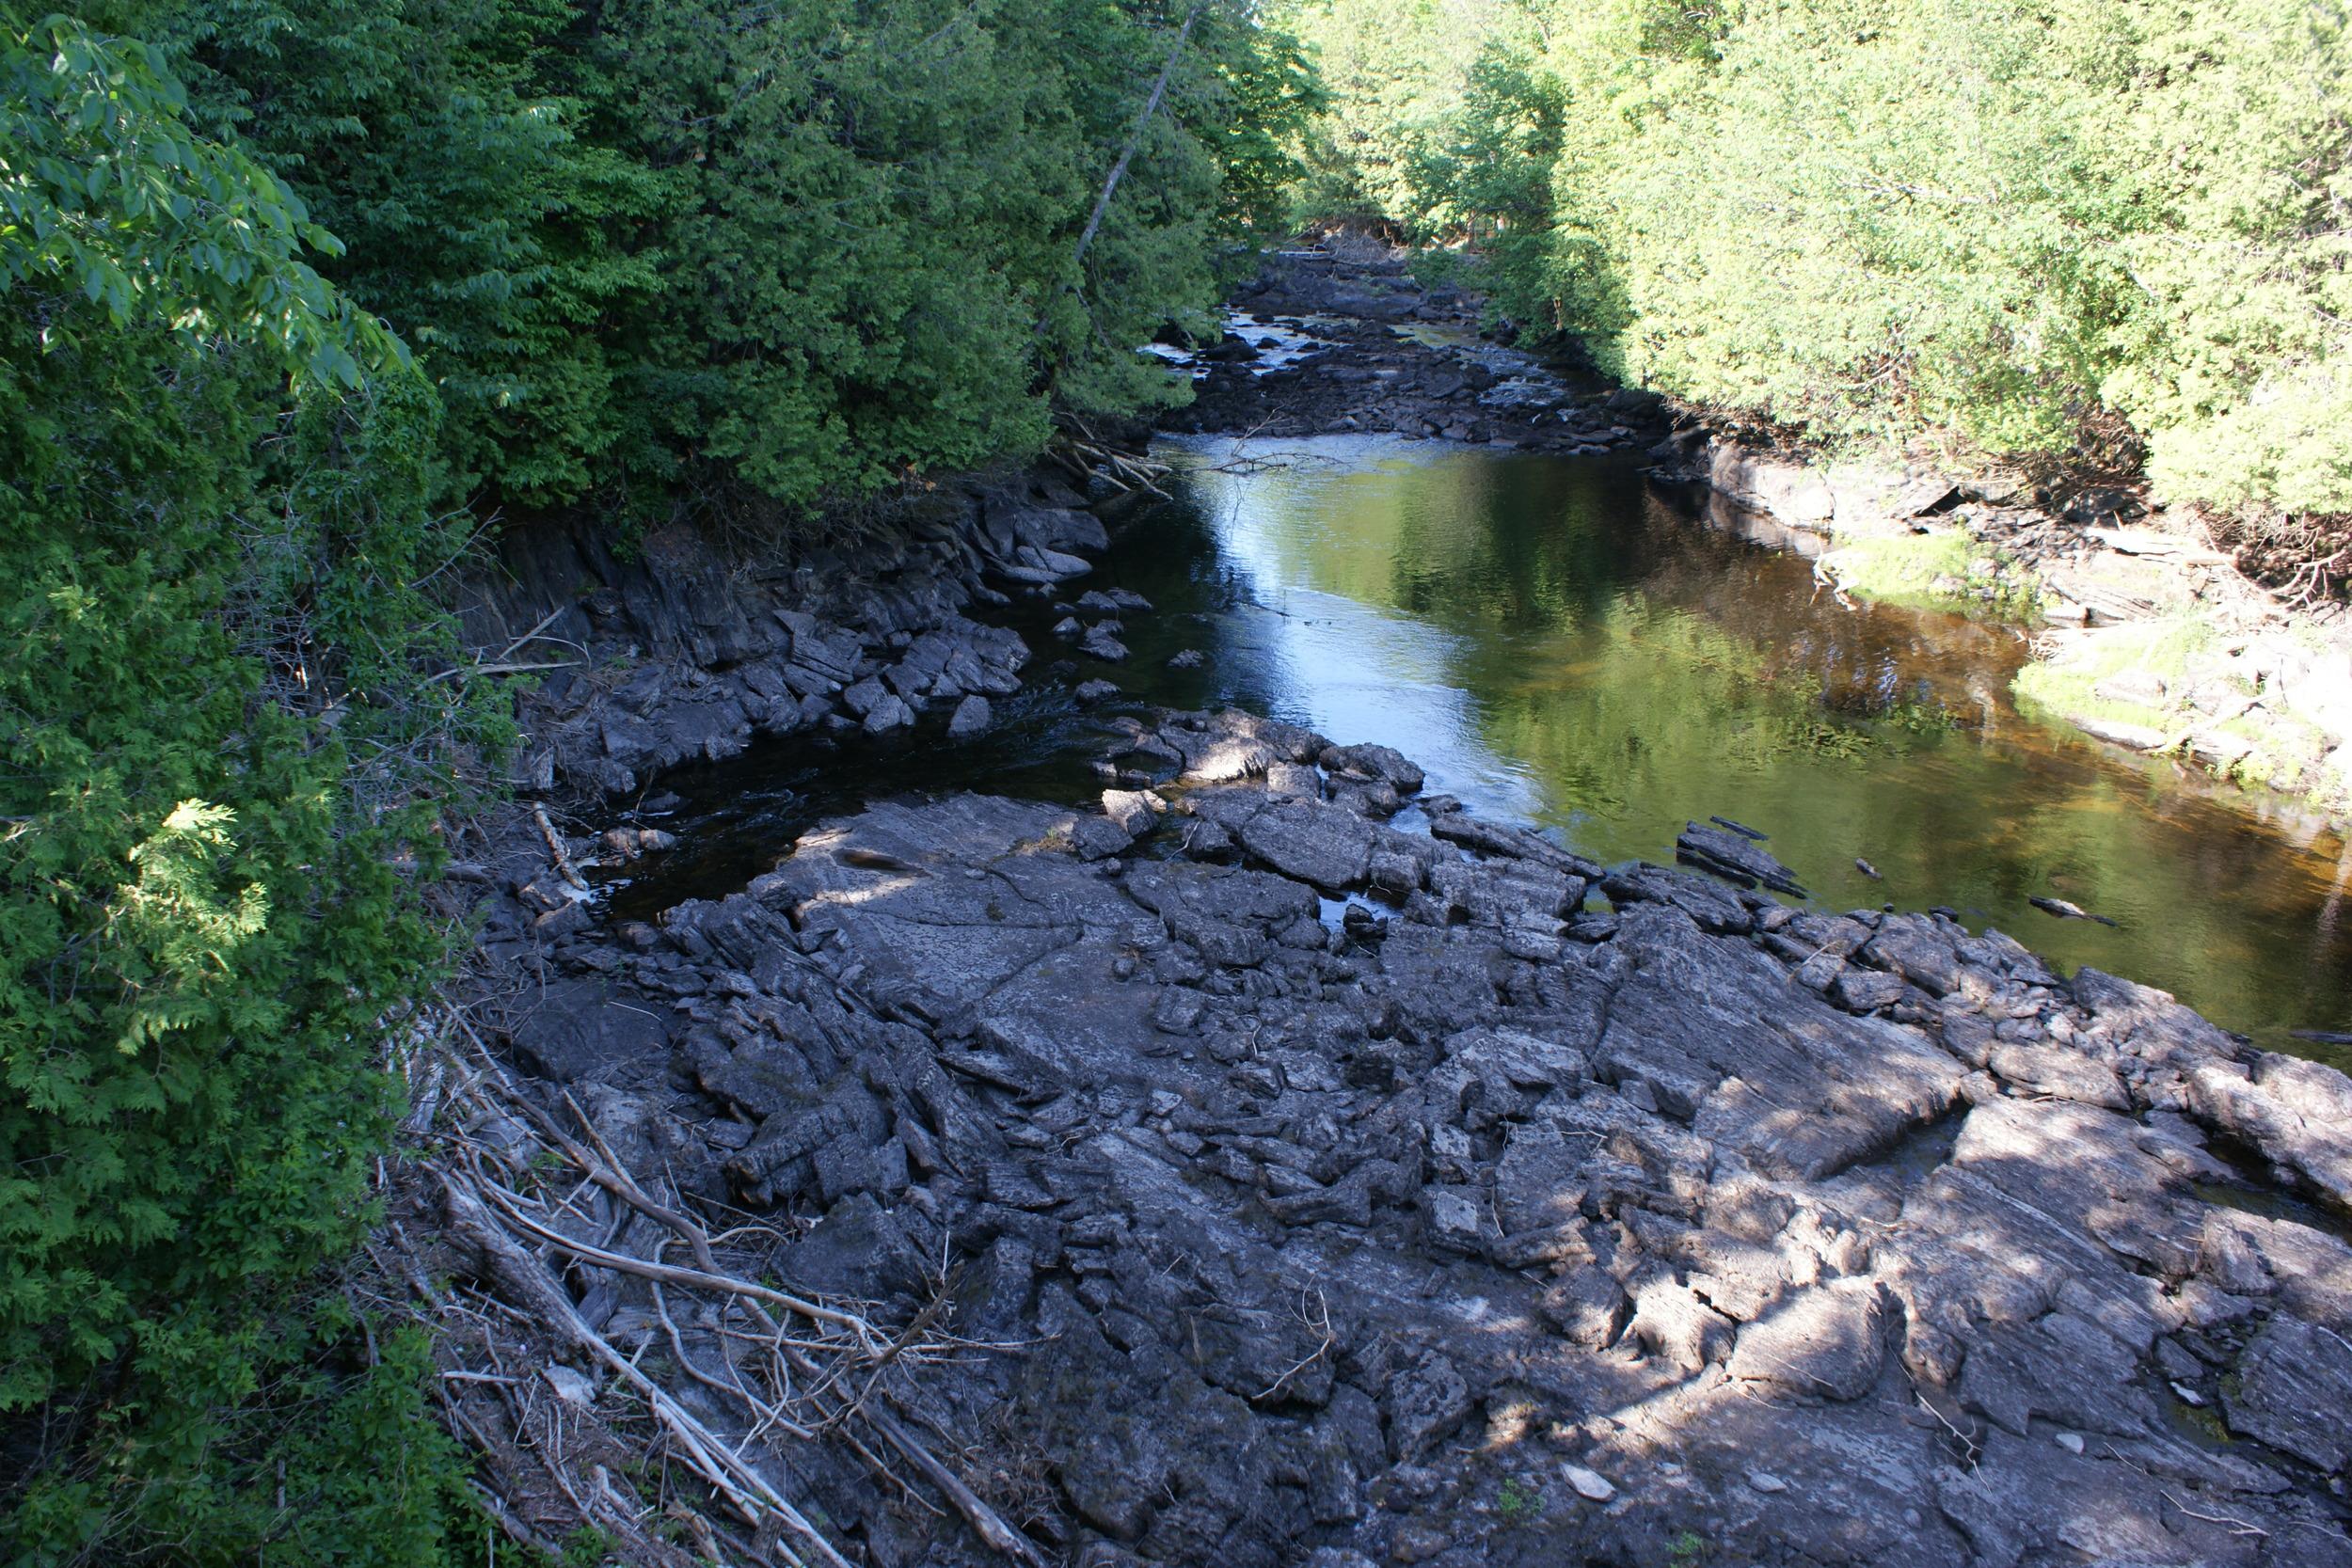 Looking upstream from the Glanmire Bridge